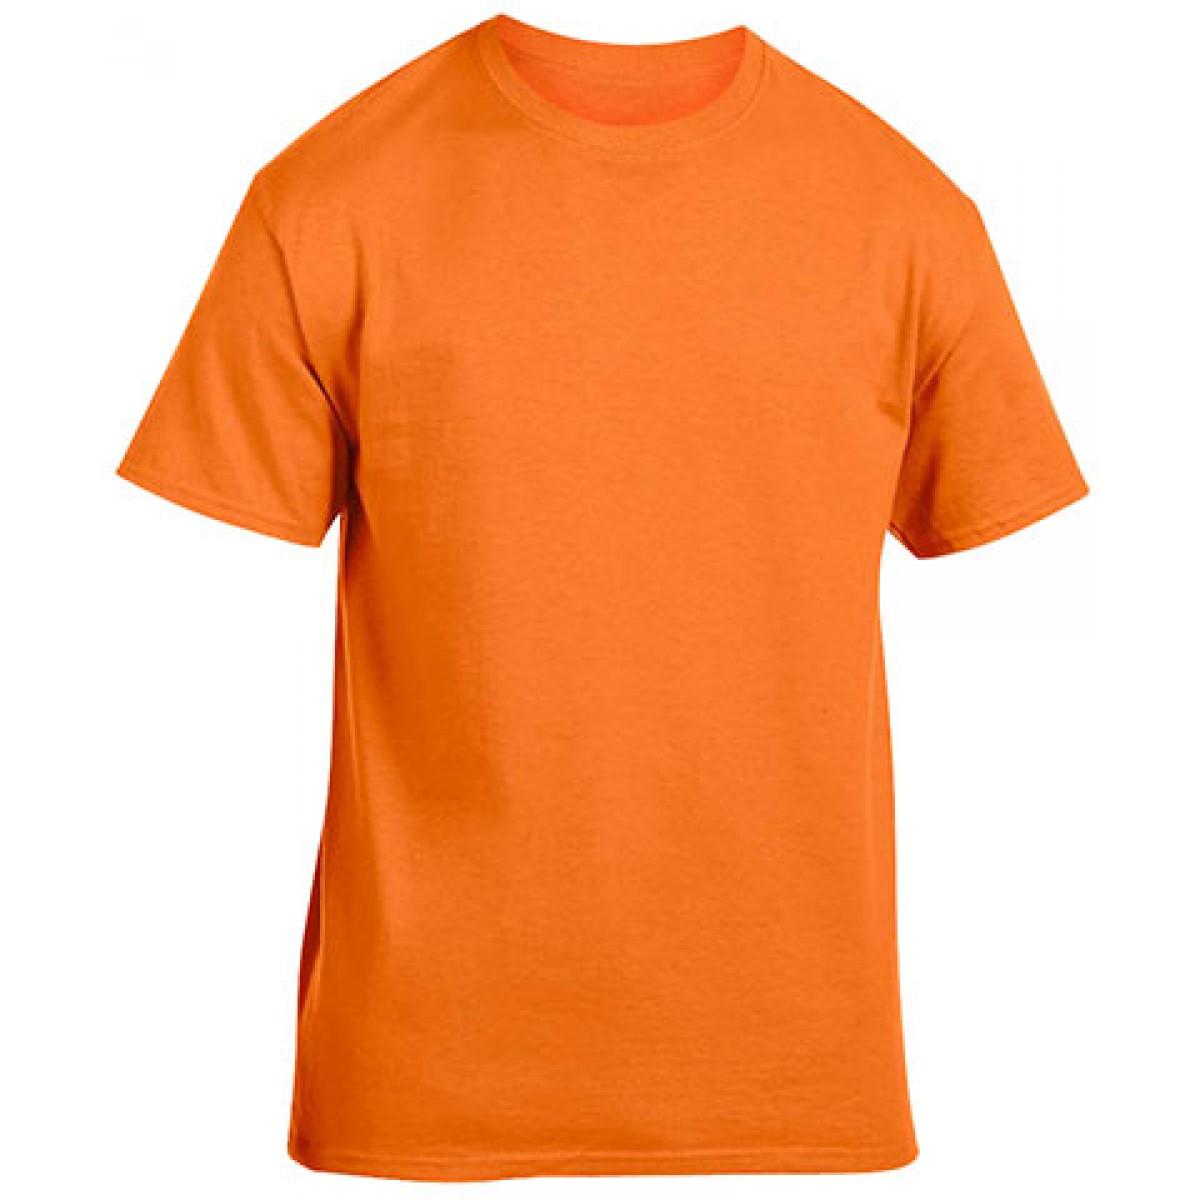 Cotton Short Sleeve T-Shirt-Safety Orange-YL